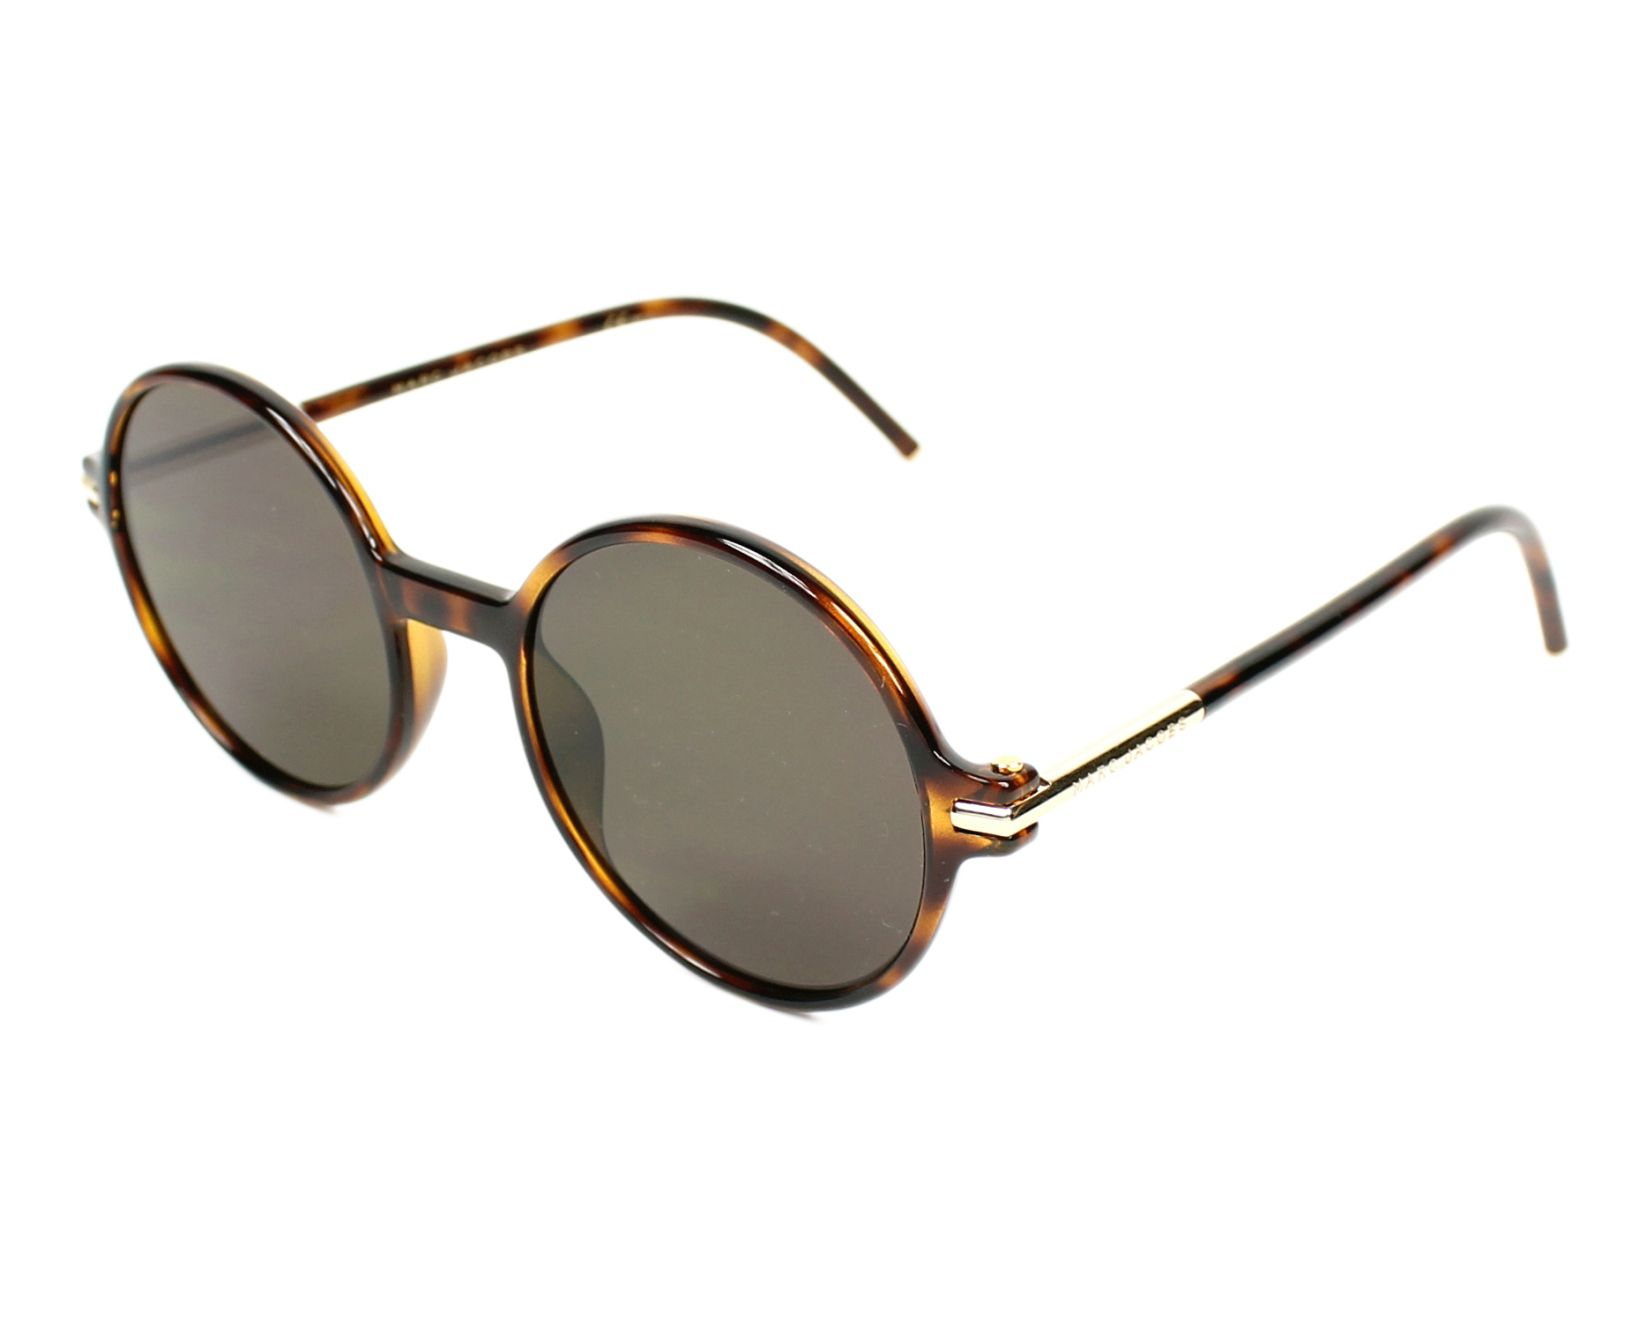 Sunglasses Marc Jacobs Marc-48-S TLR 8H 52-21 Brown profile 71e6ec375e5f